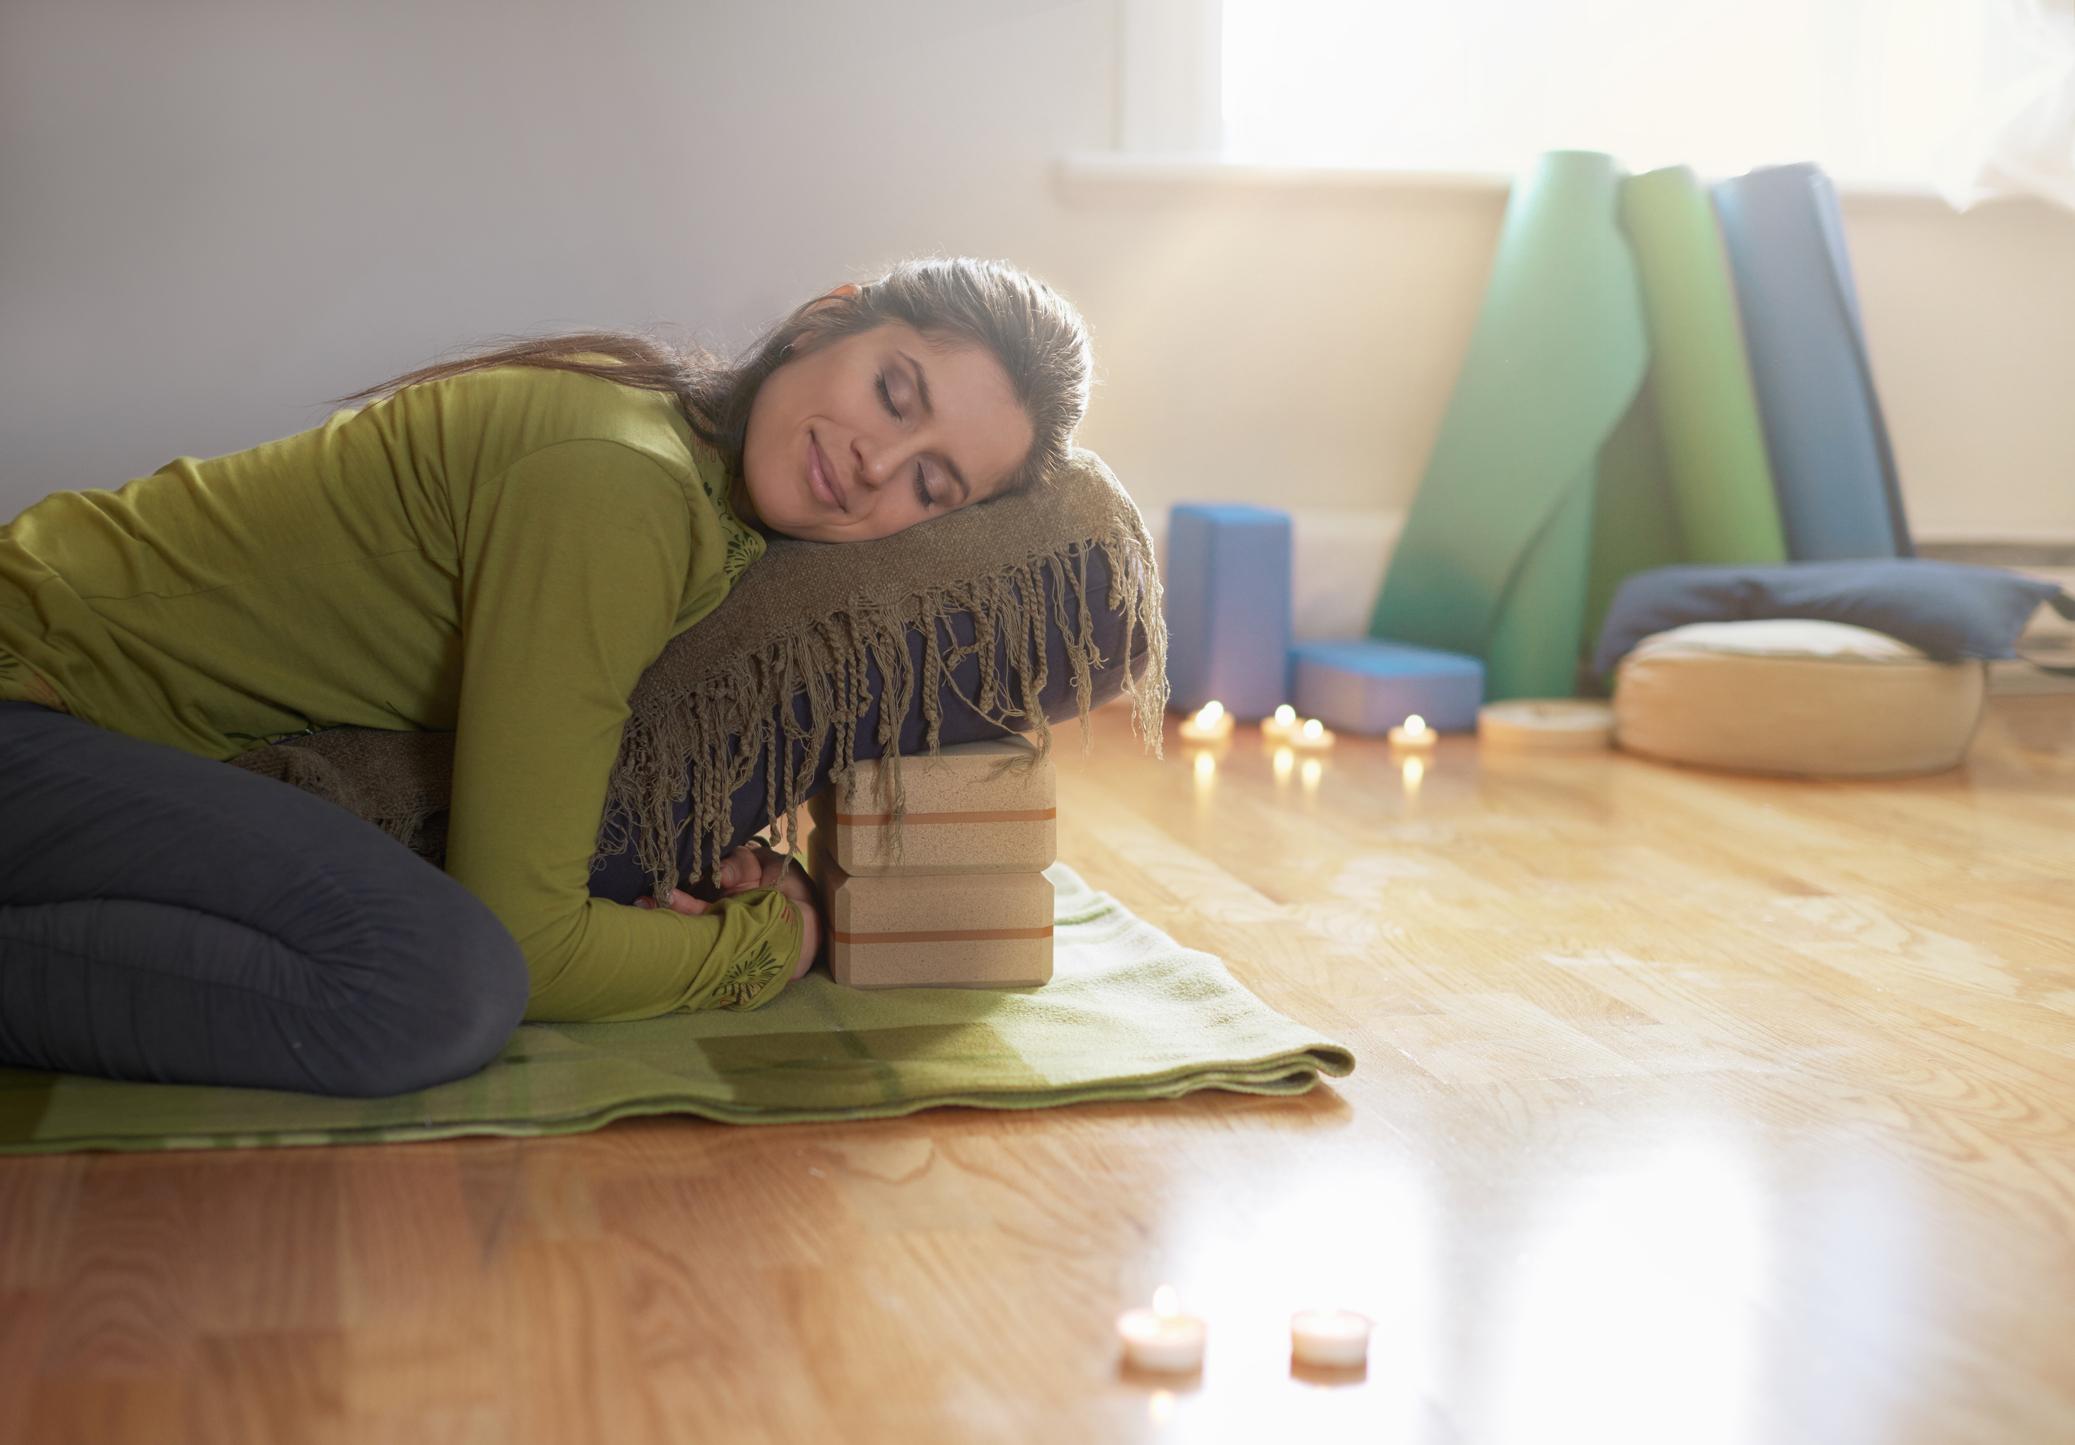 hygge-yoga-and-embracing-comfort-mark-atherton-online-yoga-training